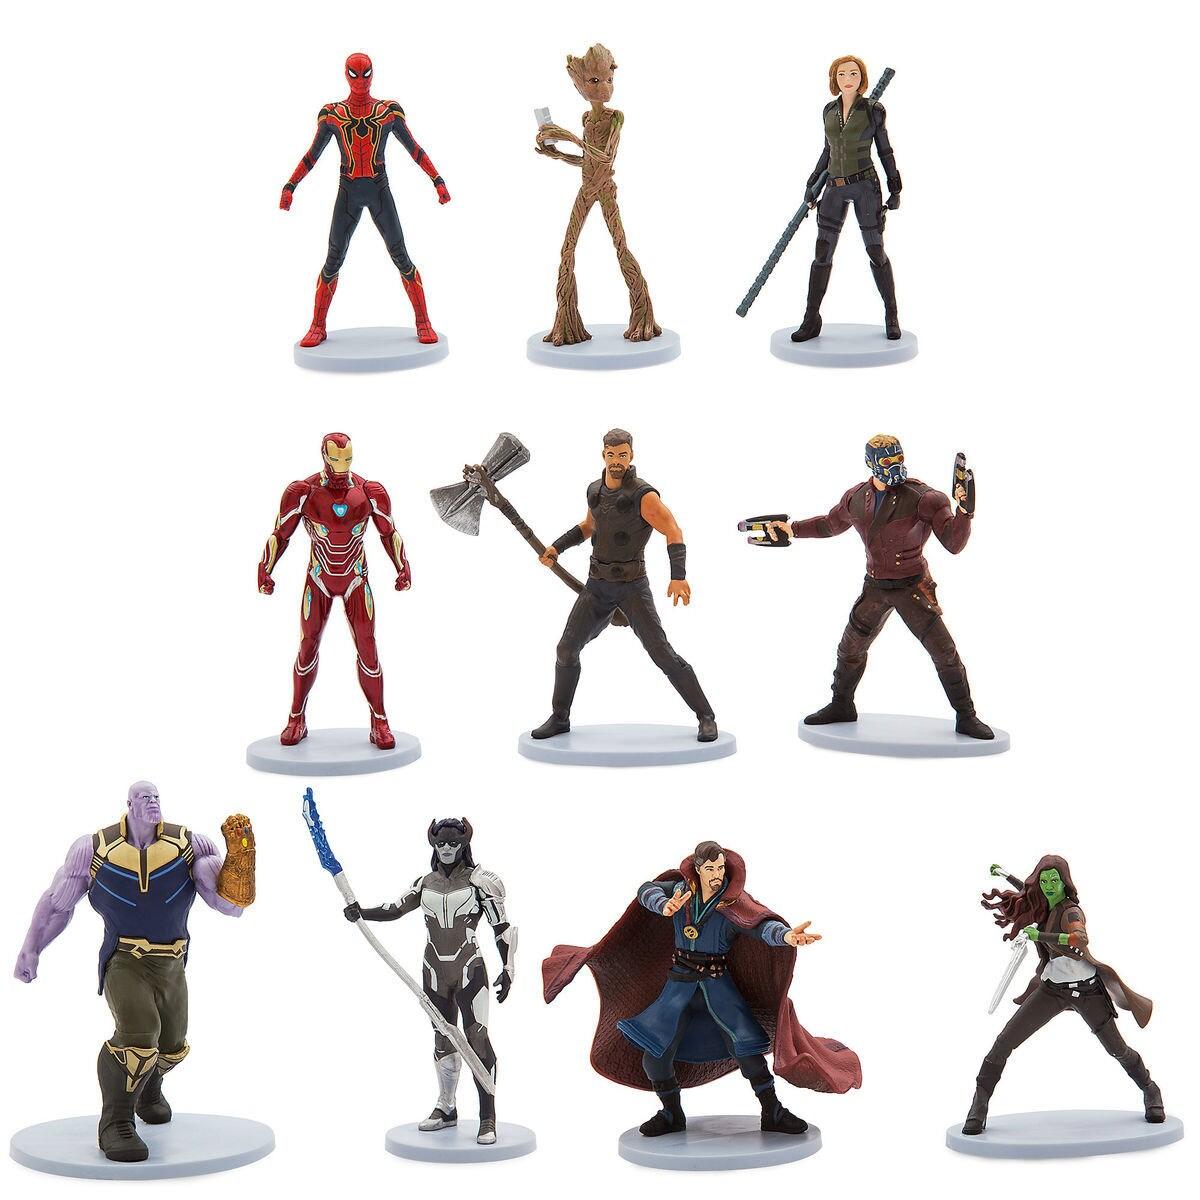 marvel's avengers: infinity war deluxe figure set | shopdisney